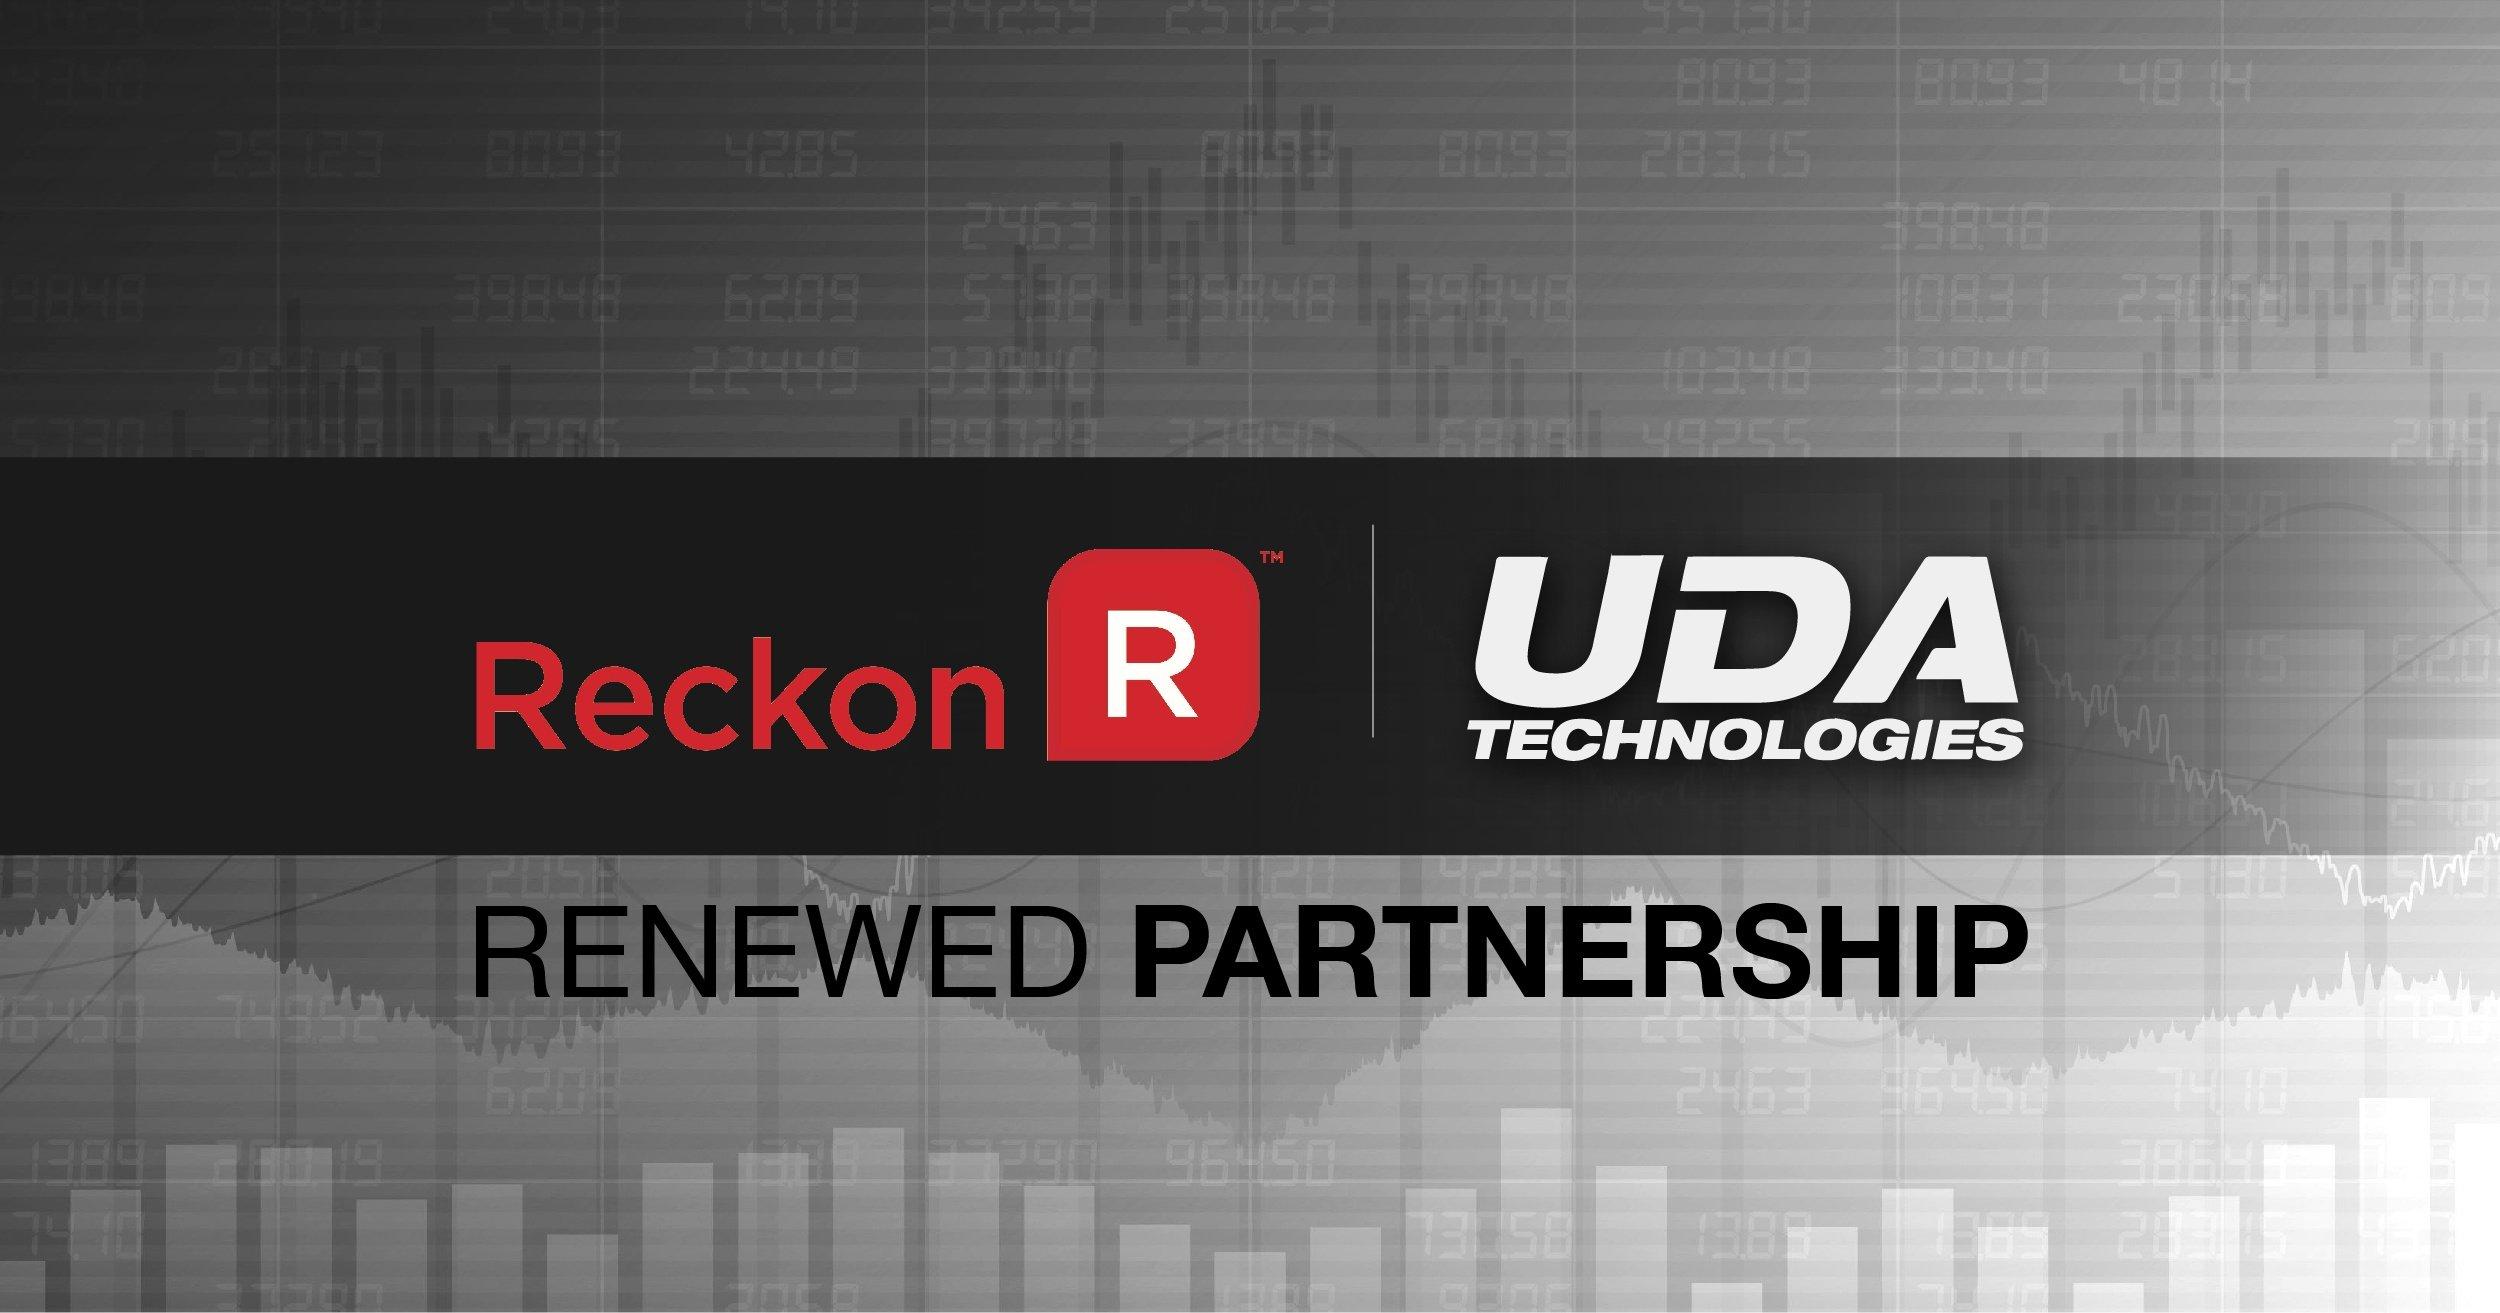 UDA + Reckon Renew Global Partnership